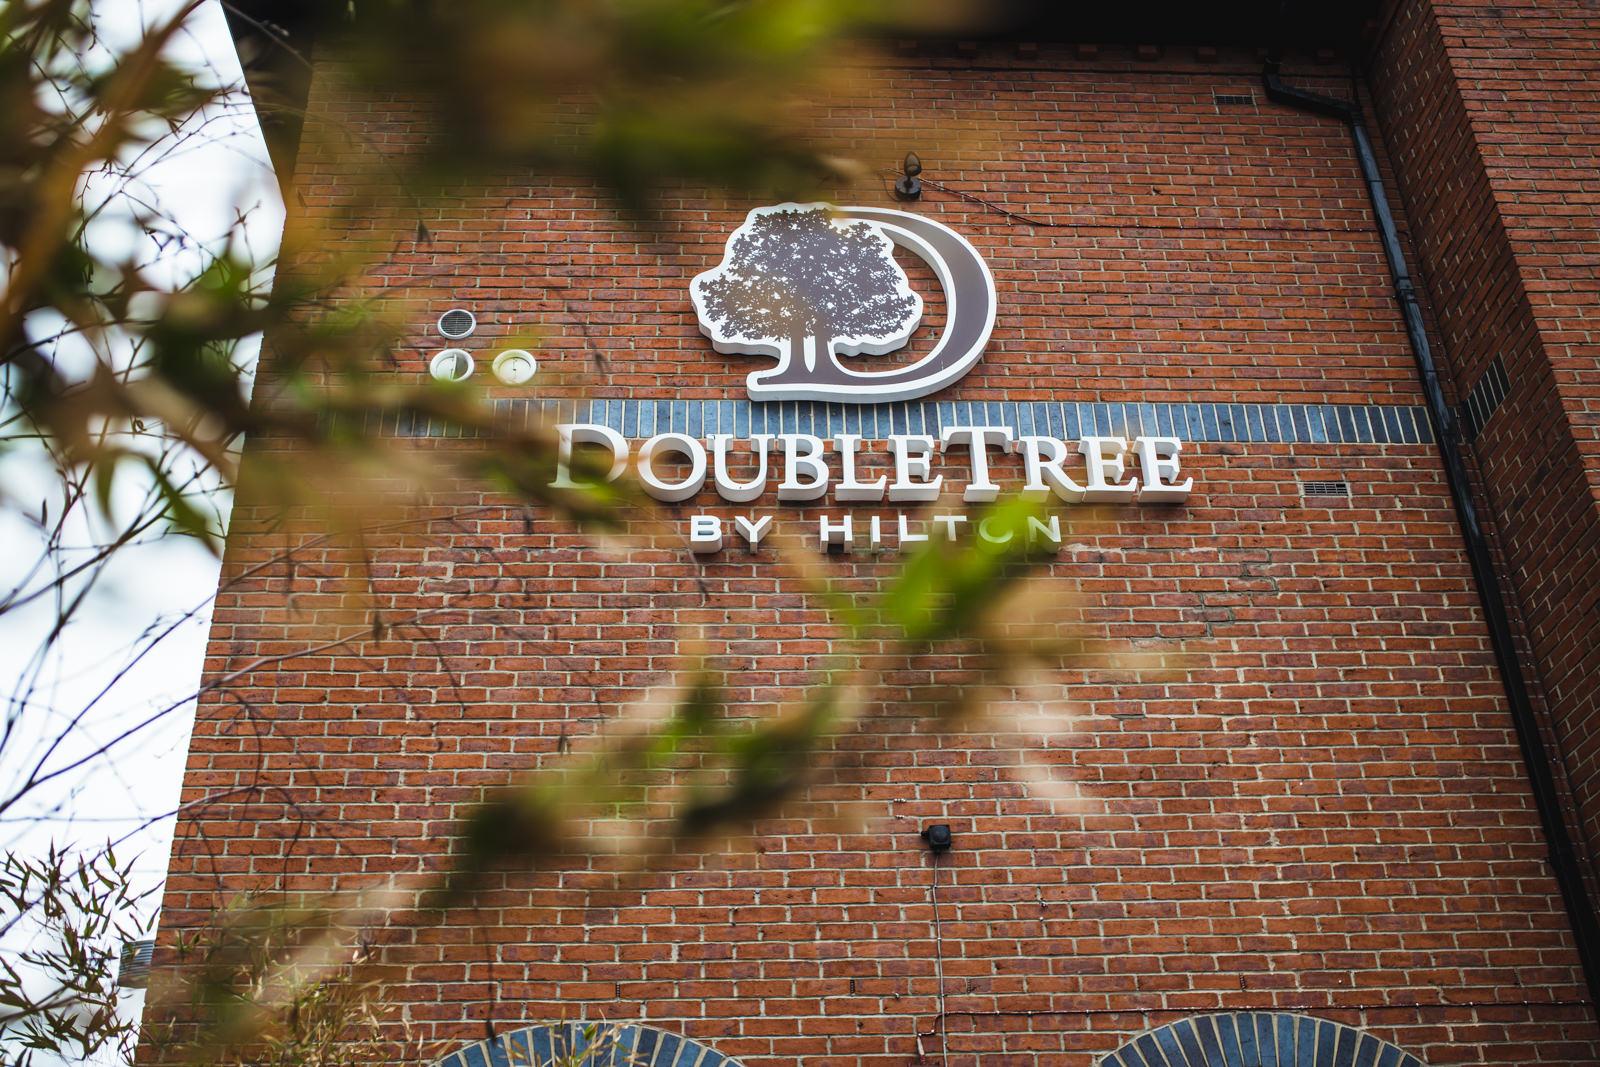 Doubletree Hilton Hotel York